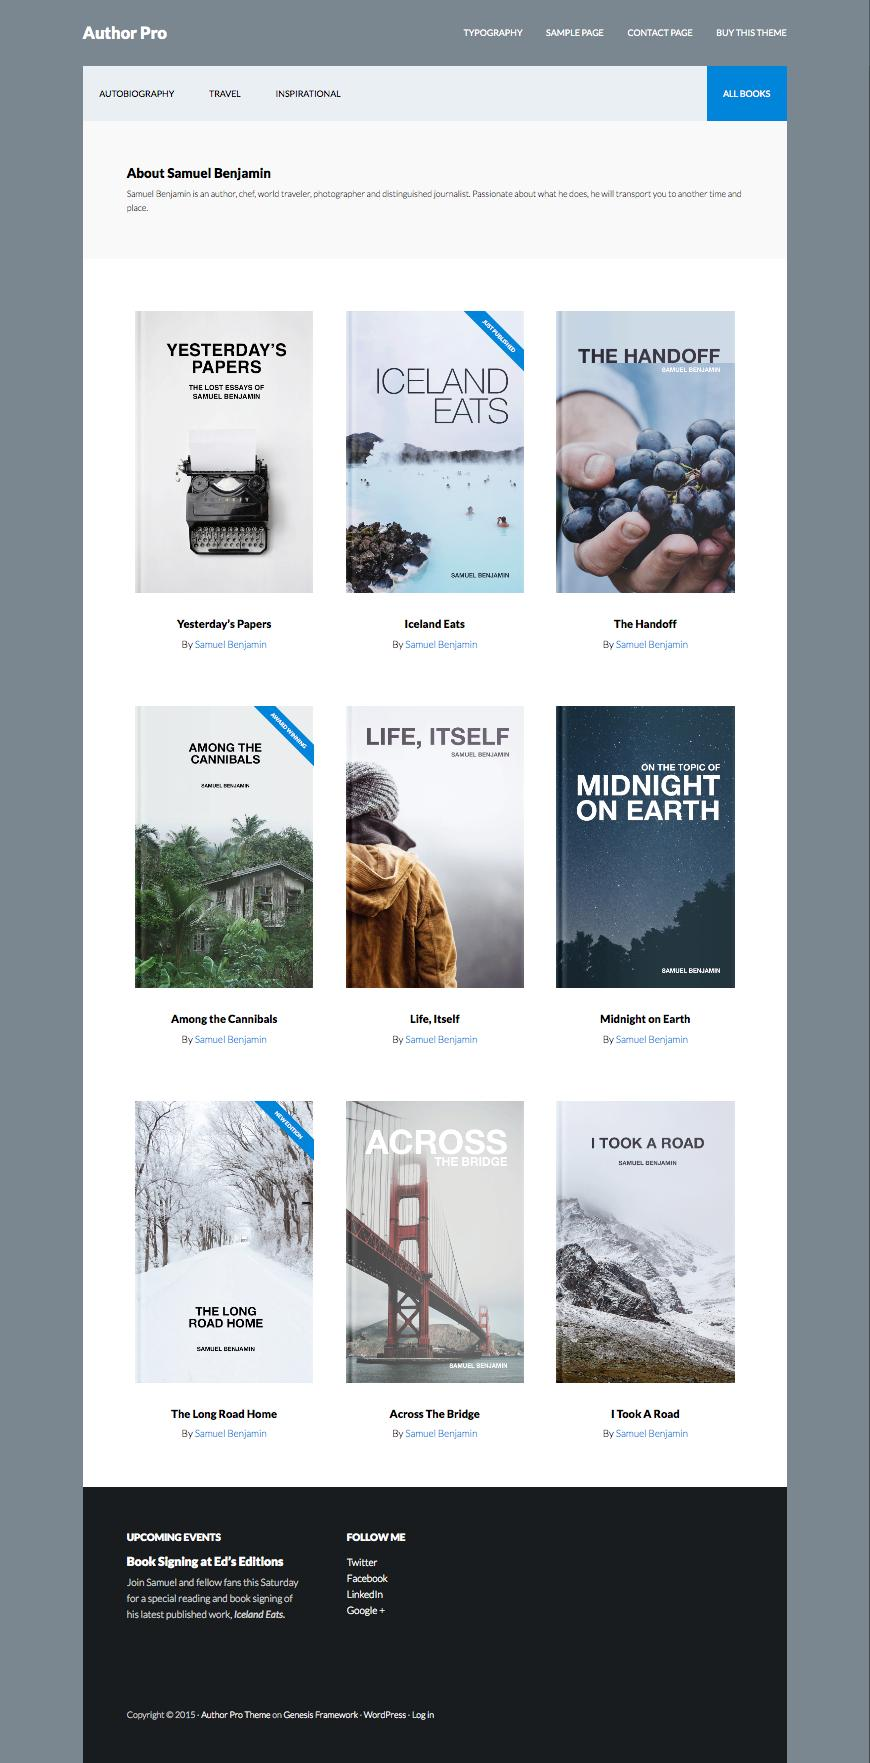 Author Pro WordPress Travel History Theme